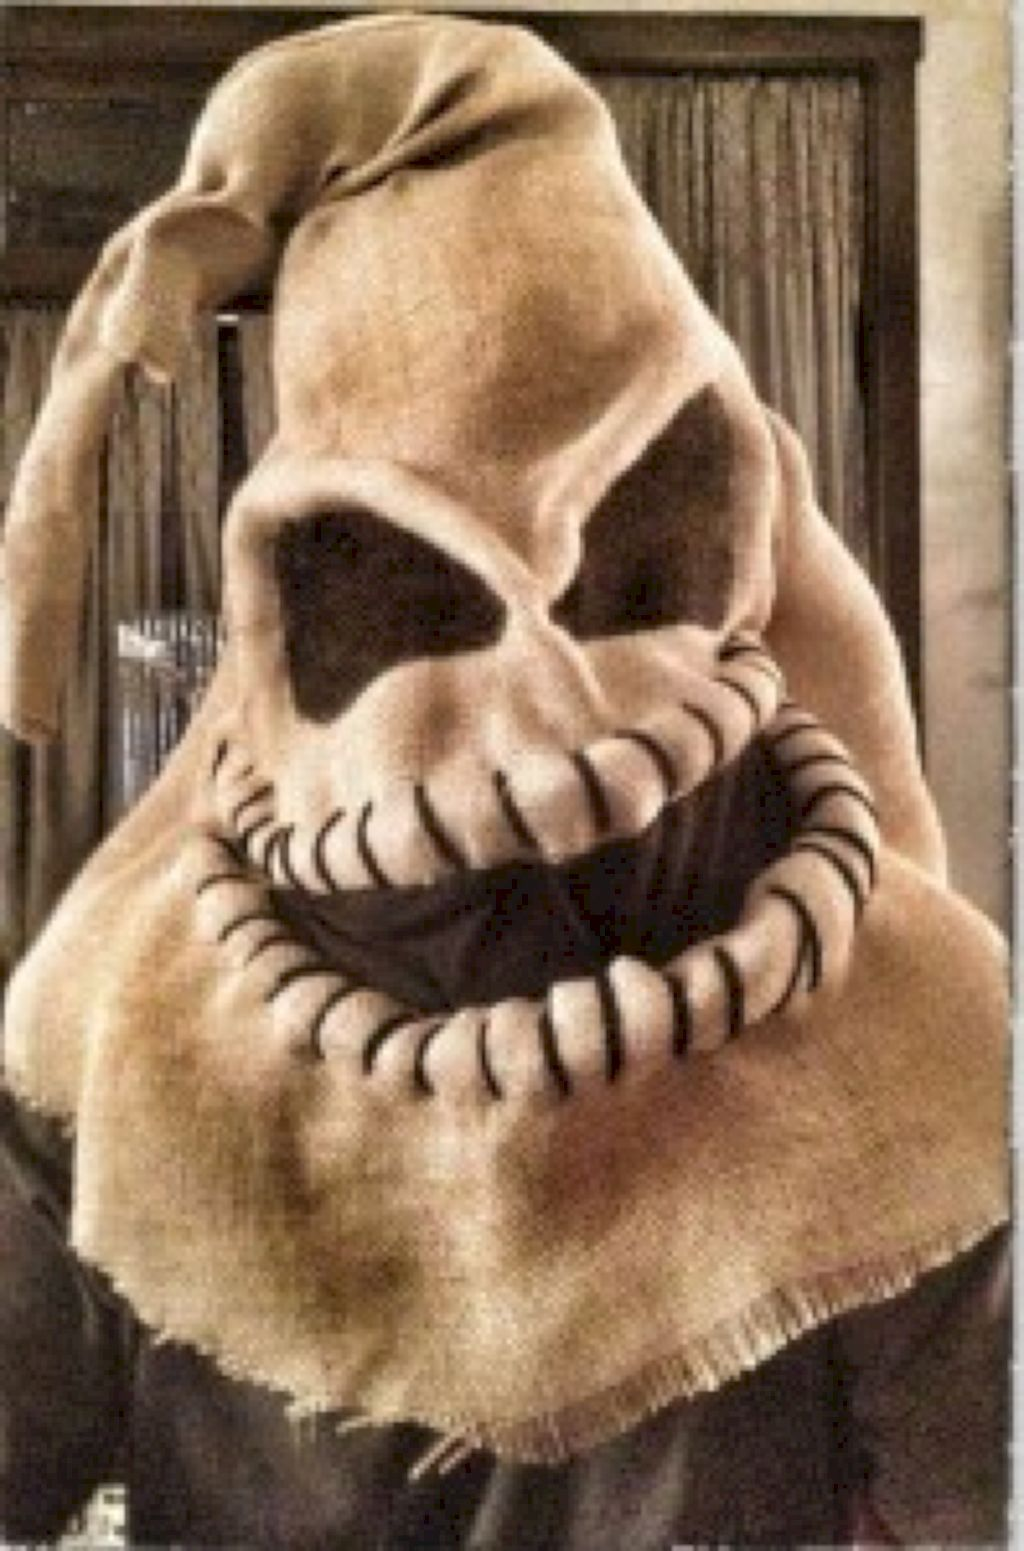 47 Easy Homemade Halloween Decor Ideas Homemade halloween and Holidays - cool homemade halloween decorations